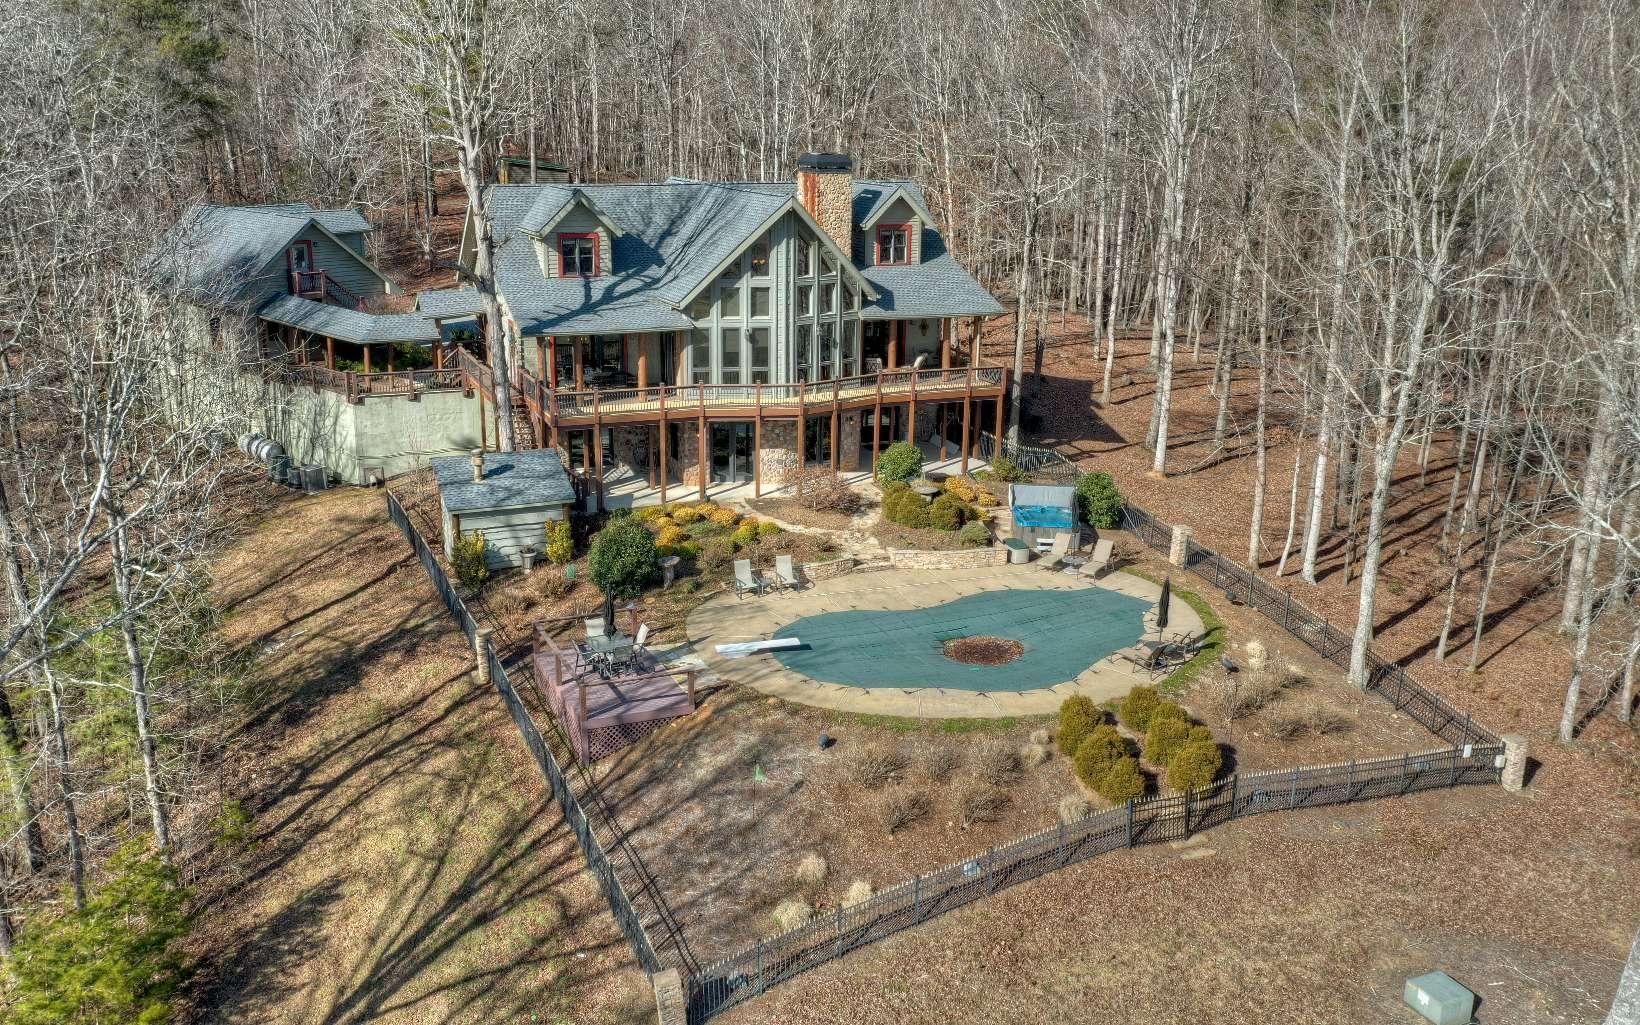 569 PETTIT RD, Ellijay, Georgia 30536, 5 Bedrooms Bedrooms, ,5 BathroomsBathrooms,Single Family,For Sale,569 PETTIT RD,303787